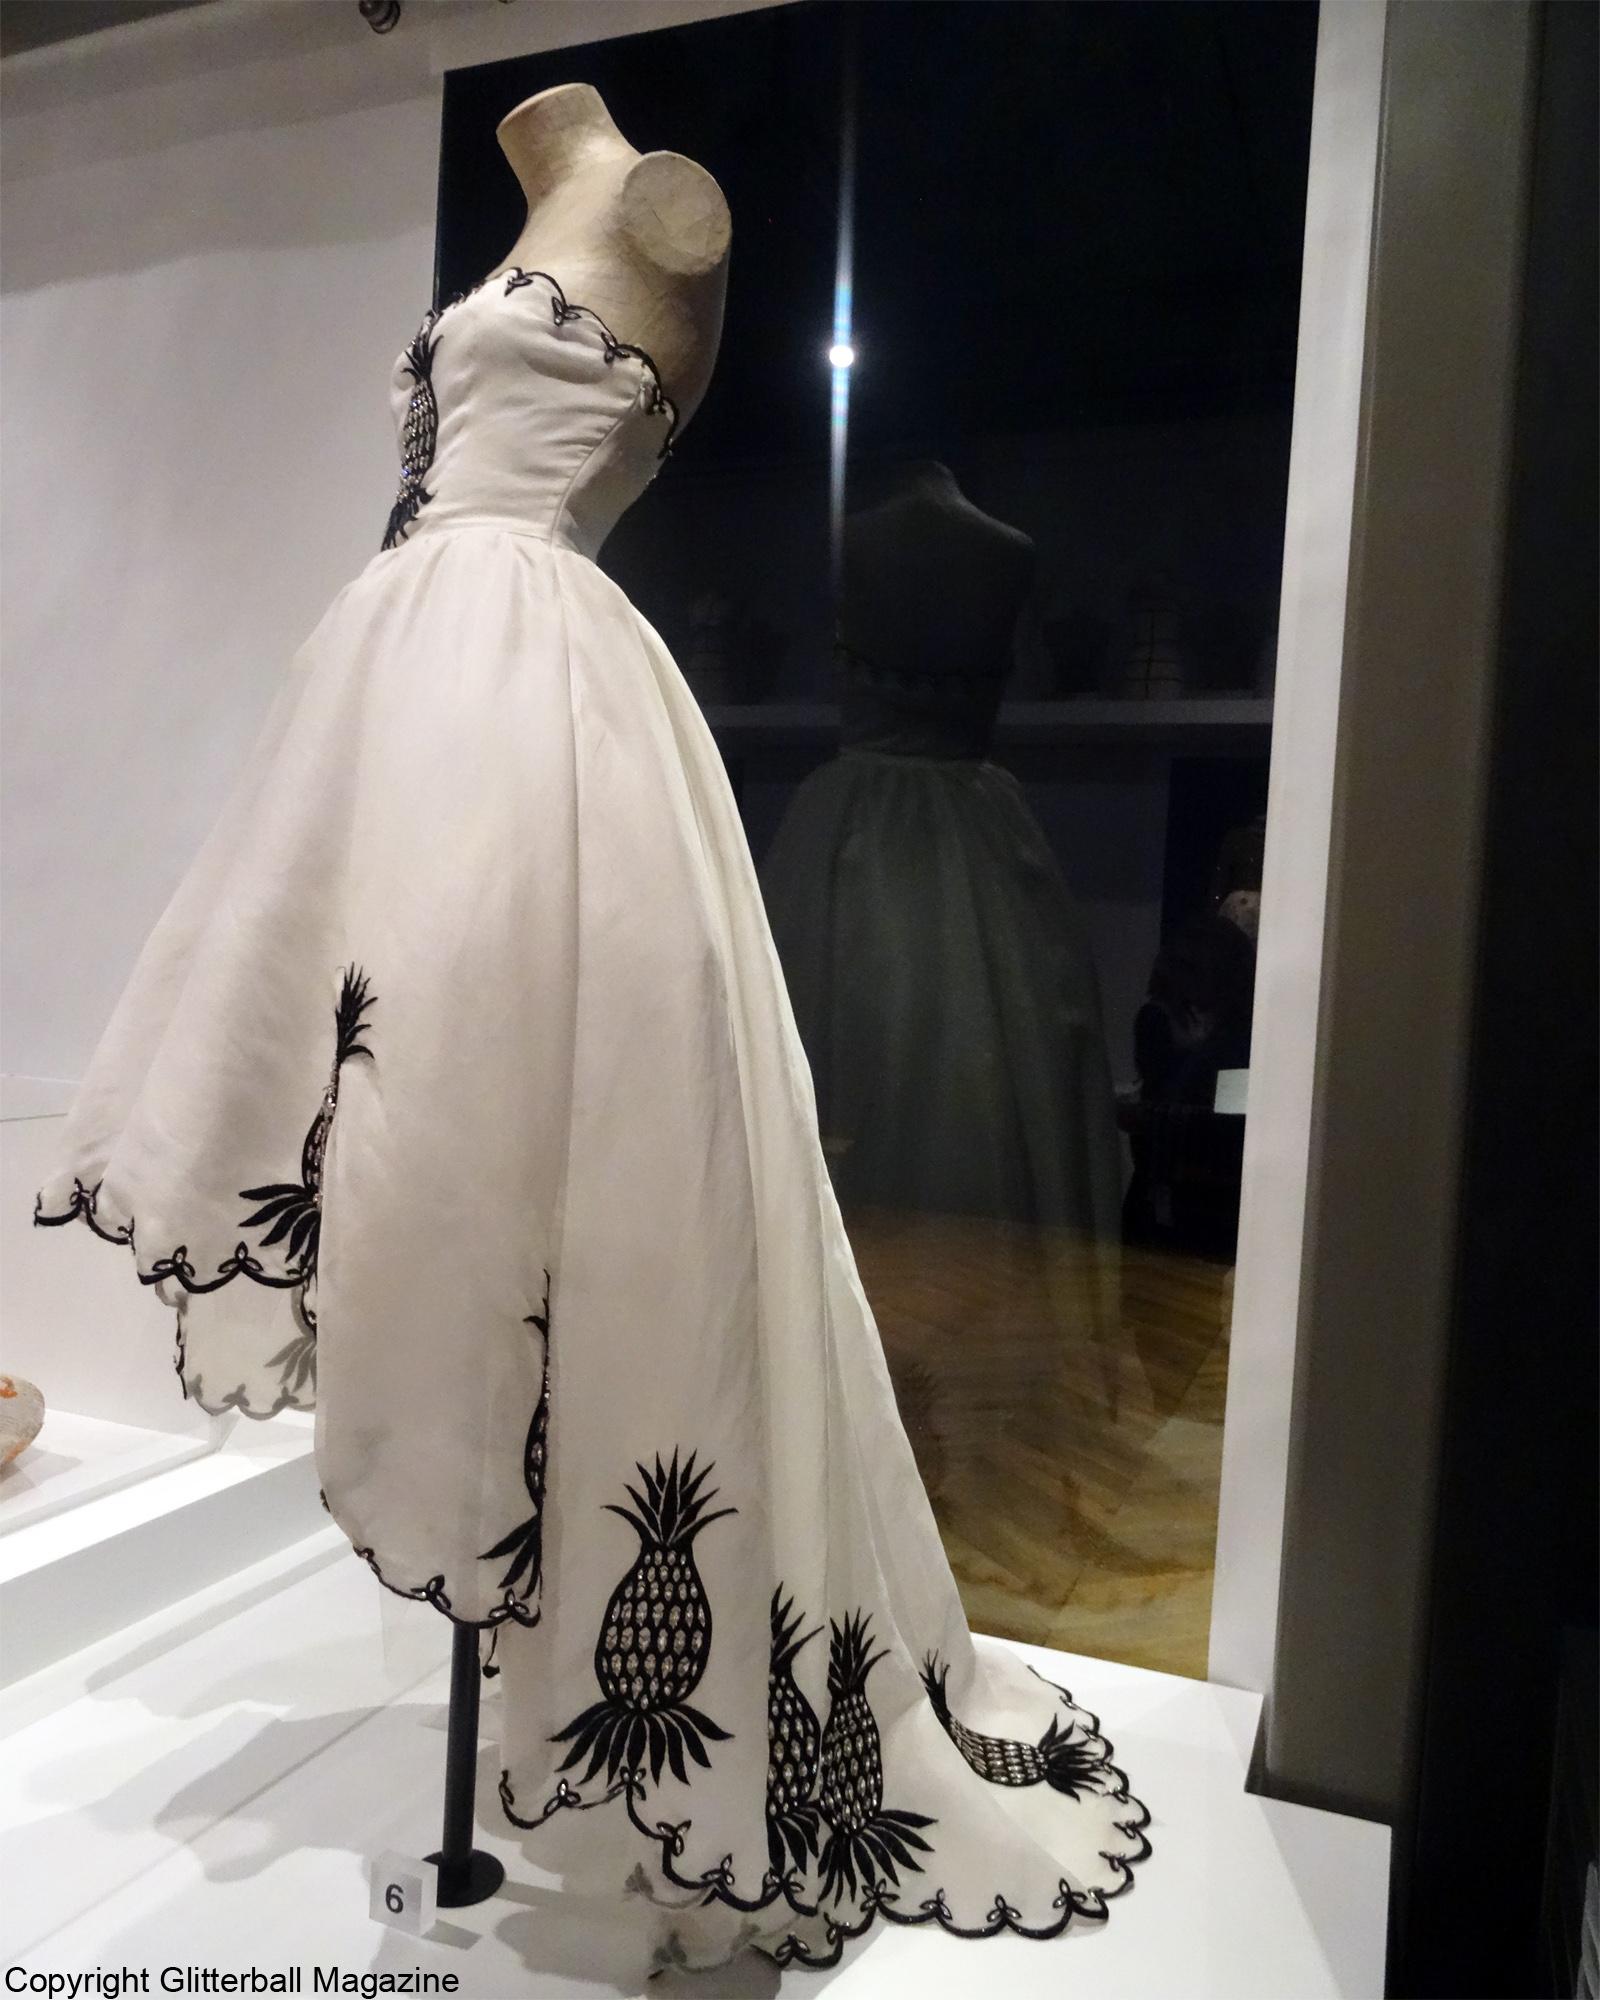 ysl fruit dress